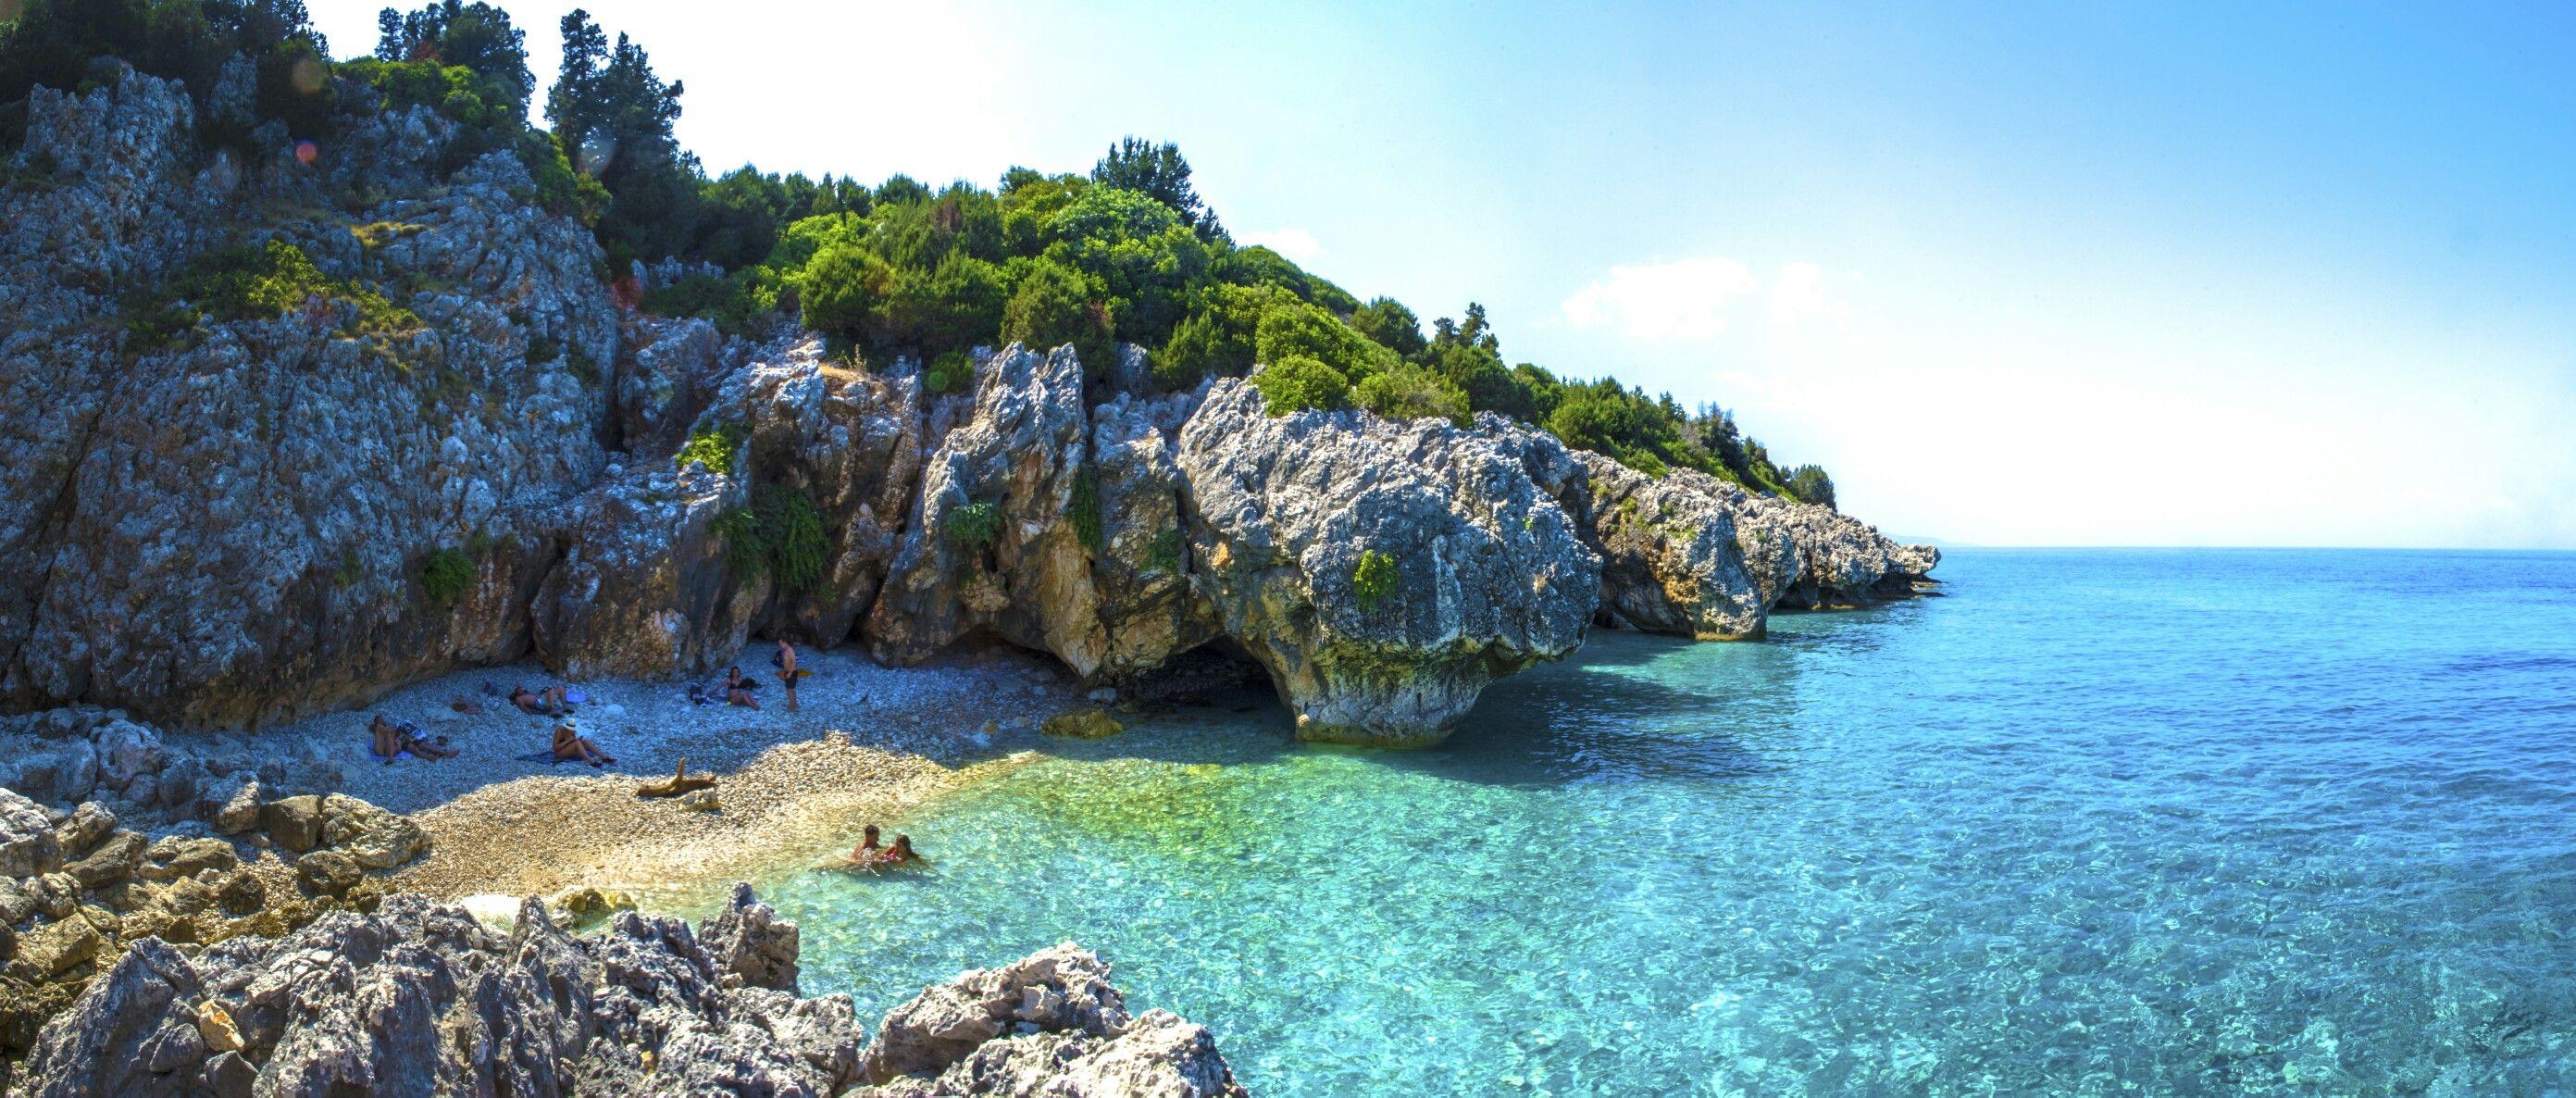 Kato lagadi Beach, Kefalonia, Greece